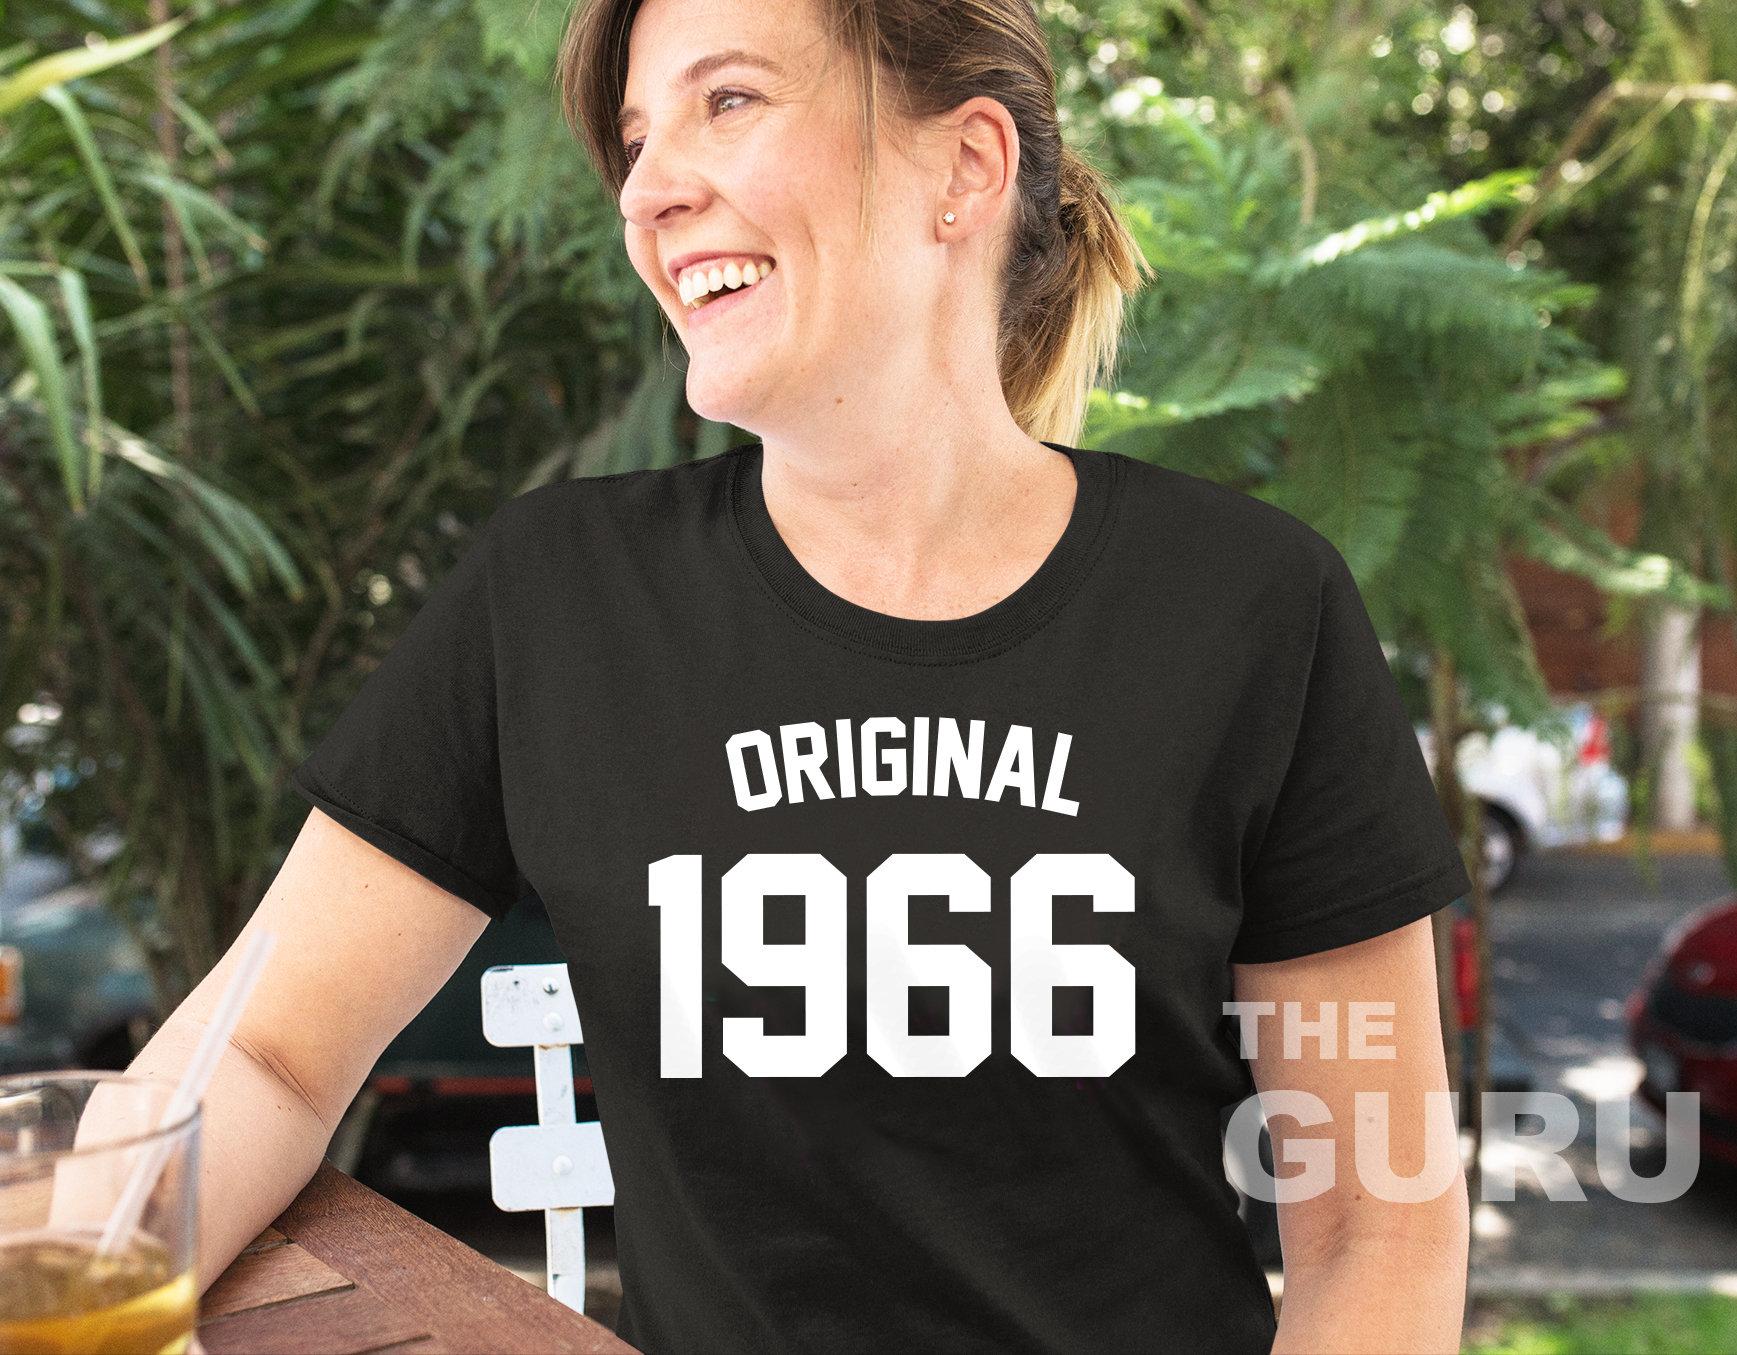 52 birthday shirt 1966 birthday shirt 52 birthday 52nd gift for women 52nd birthday birthday gift 52nd birthday shirts 52nd birthday gift for men original 535894